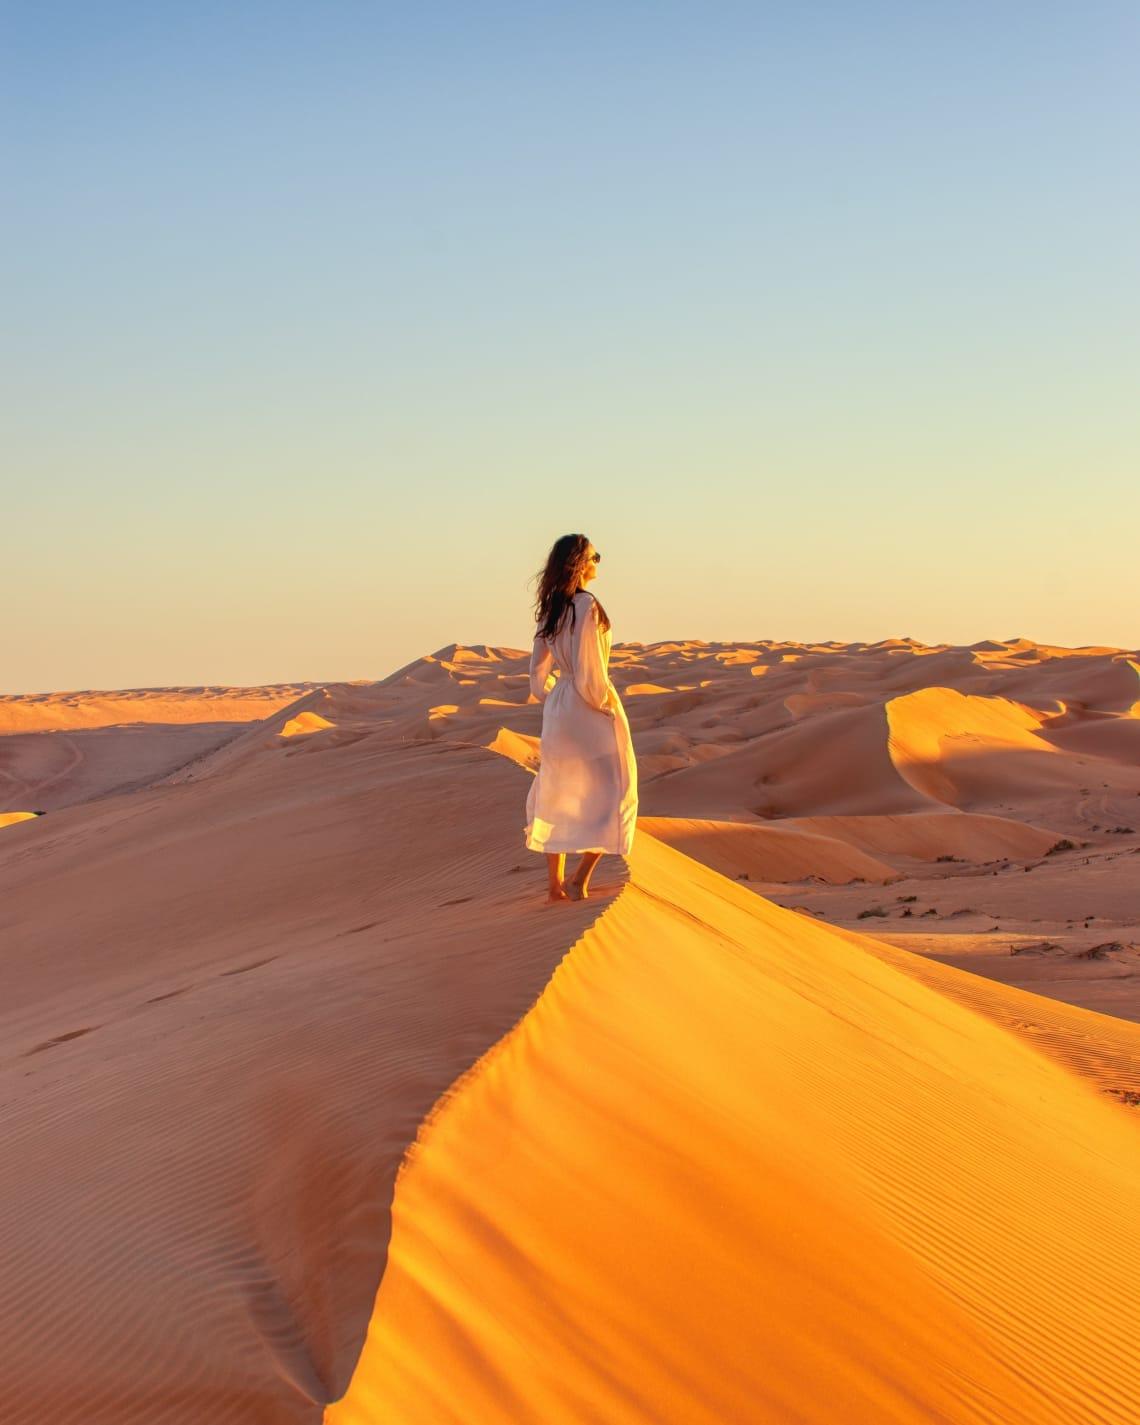 Solo female traveler watching a desert sunset